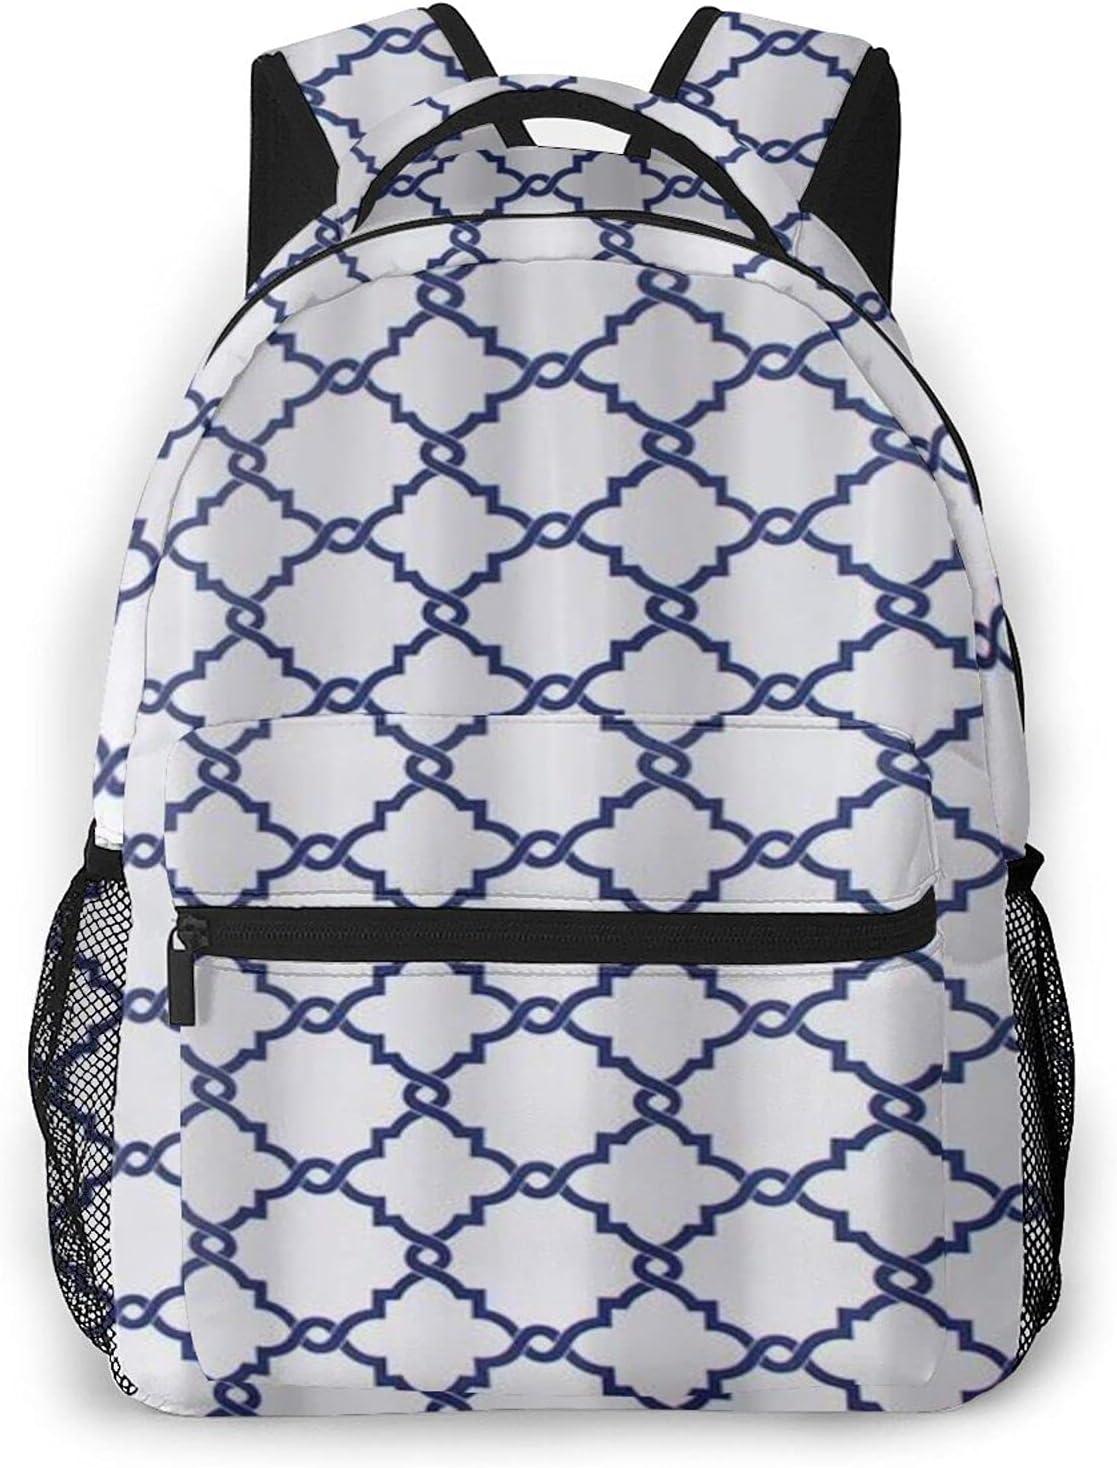 BEIDIDA Super special price Casual Laptop Genuine Backpack Purse Travel Daypack Rucksack Nav